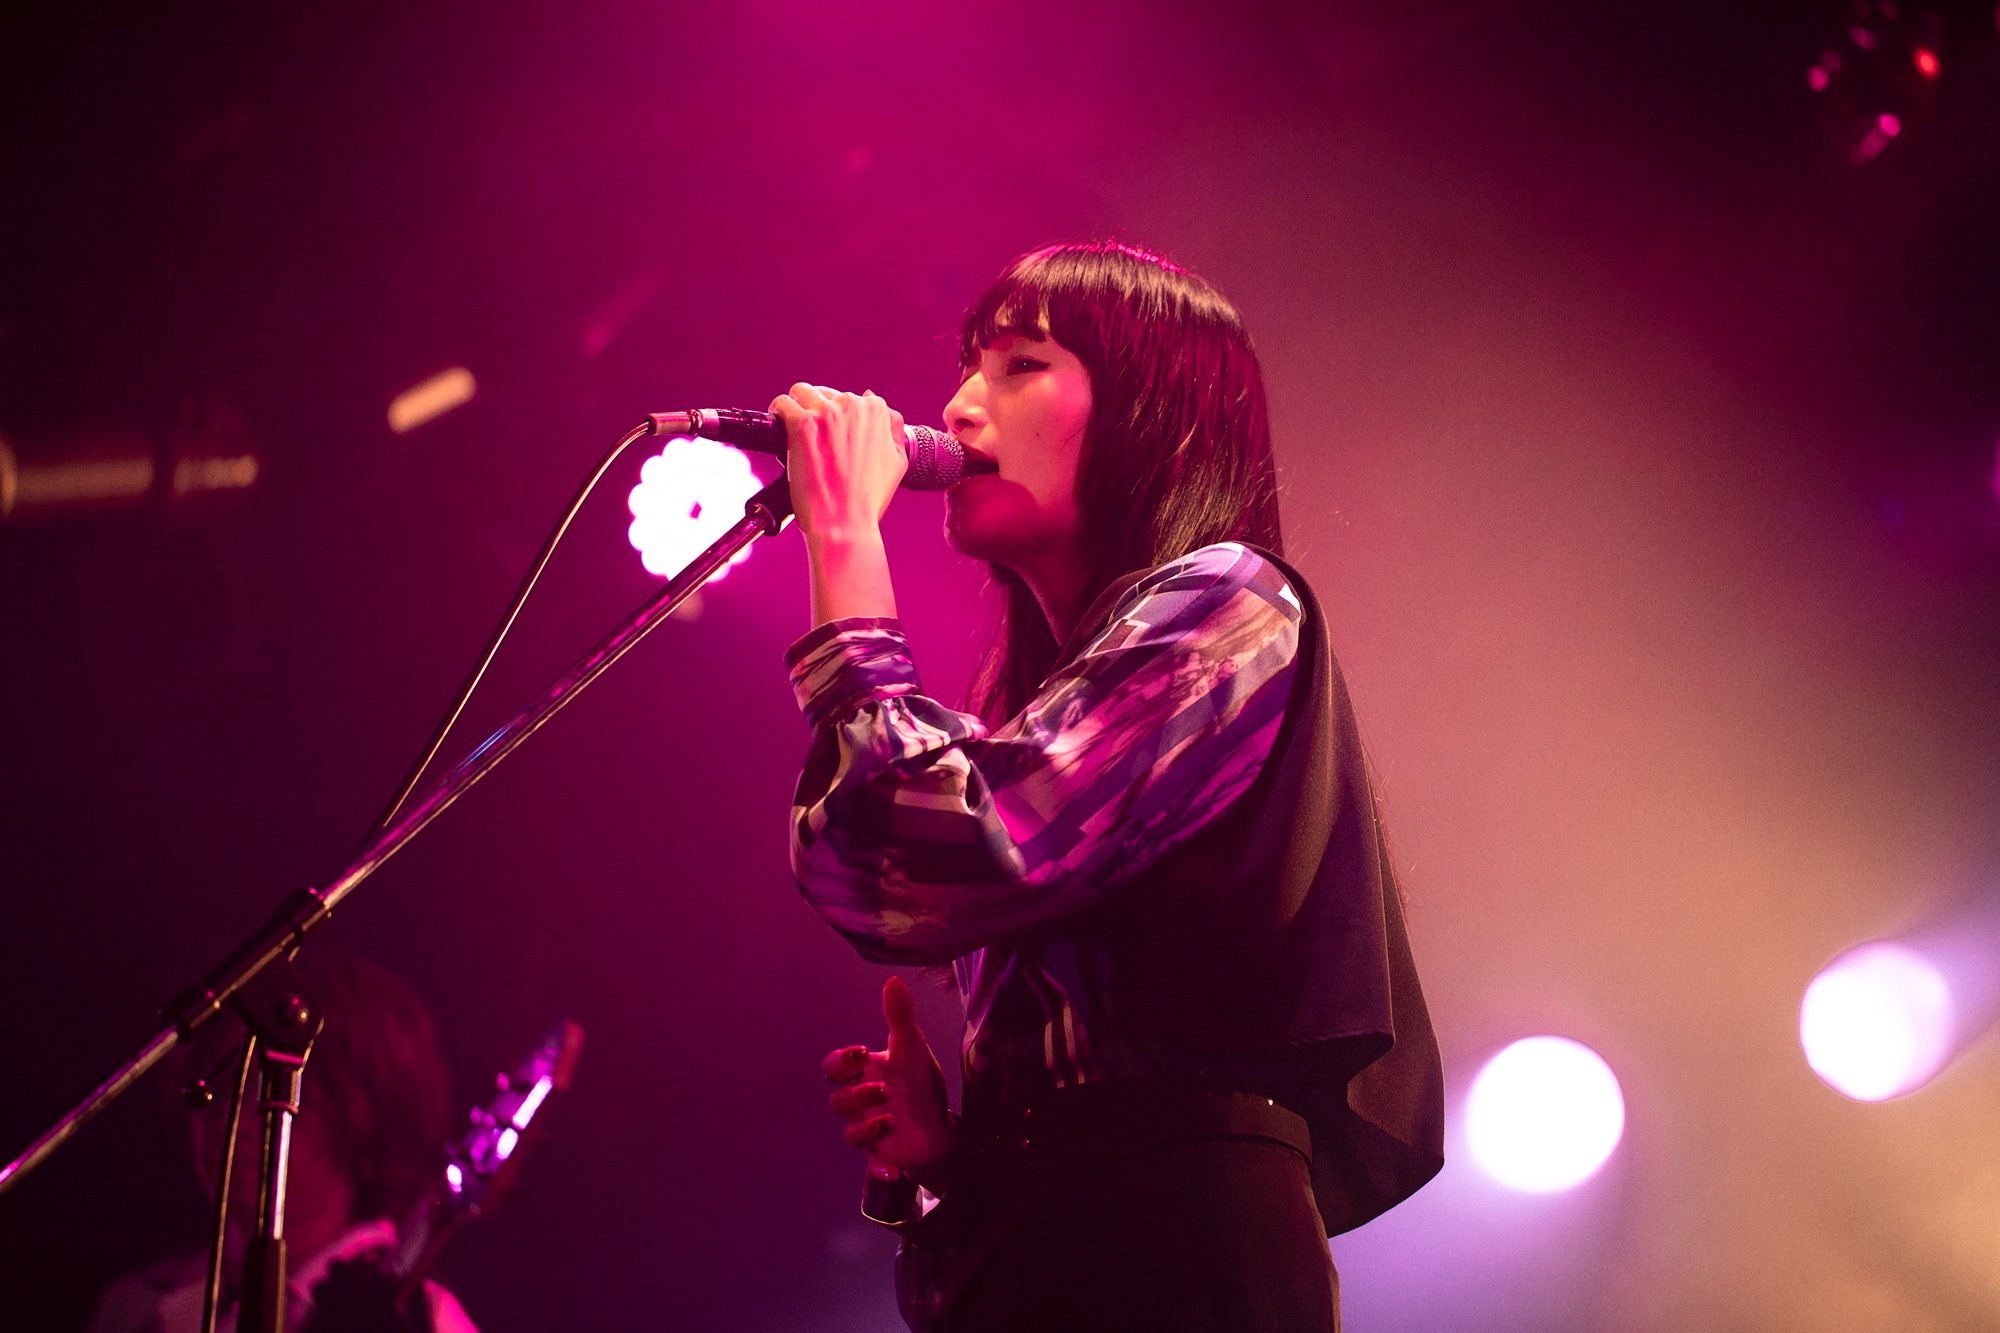 『UNIDOTS Live Tour 2020 鮮明 - clear/blur -』渋谷クラブクアトロ公演